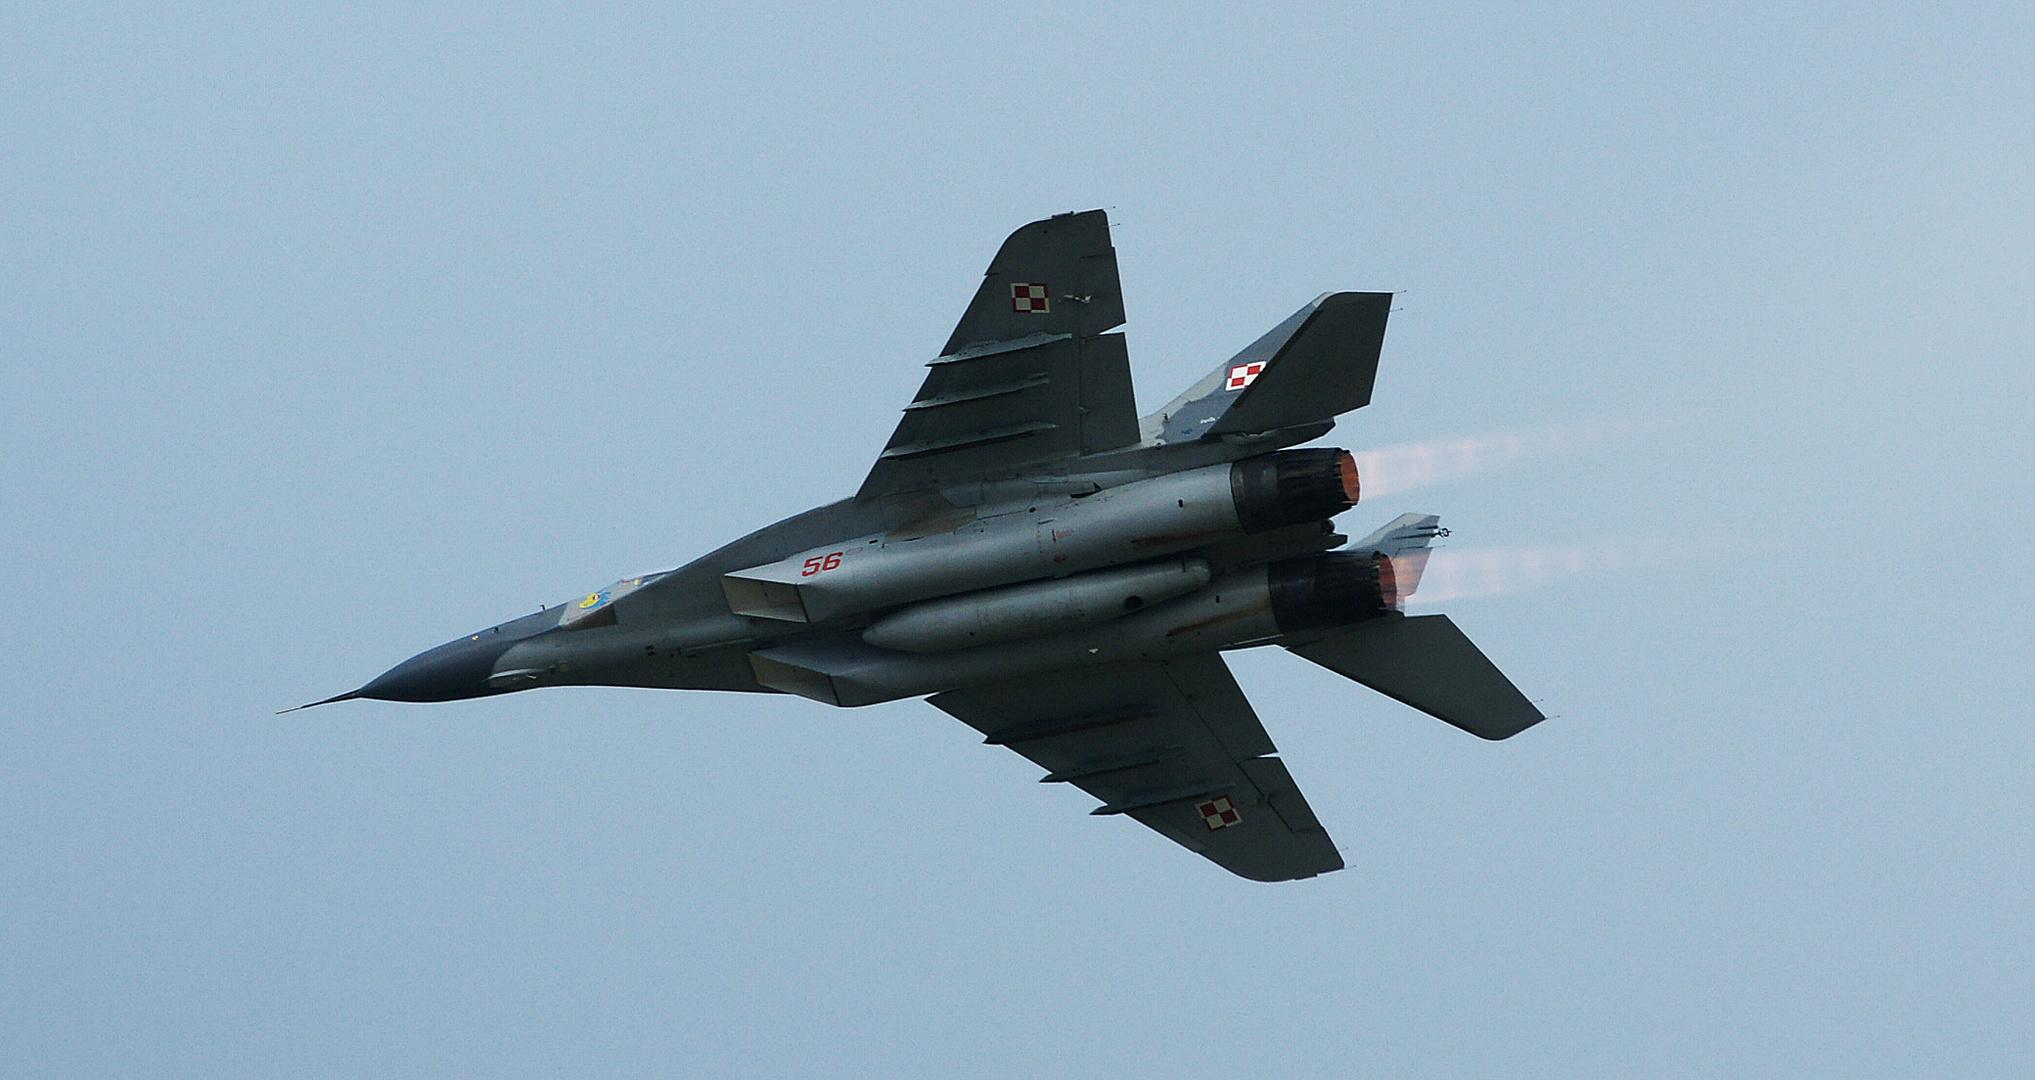 Polish Air Force *3